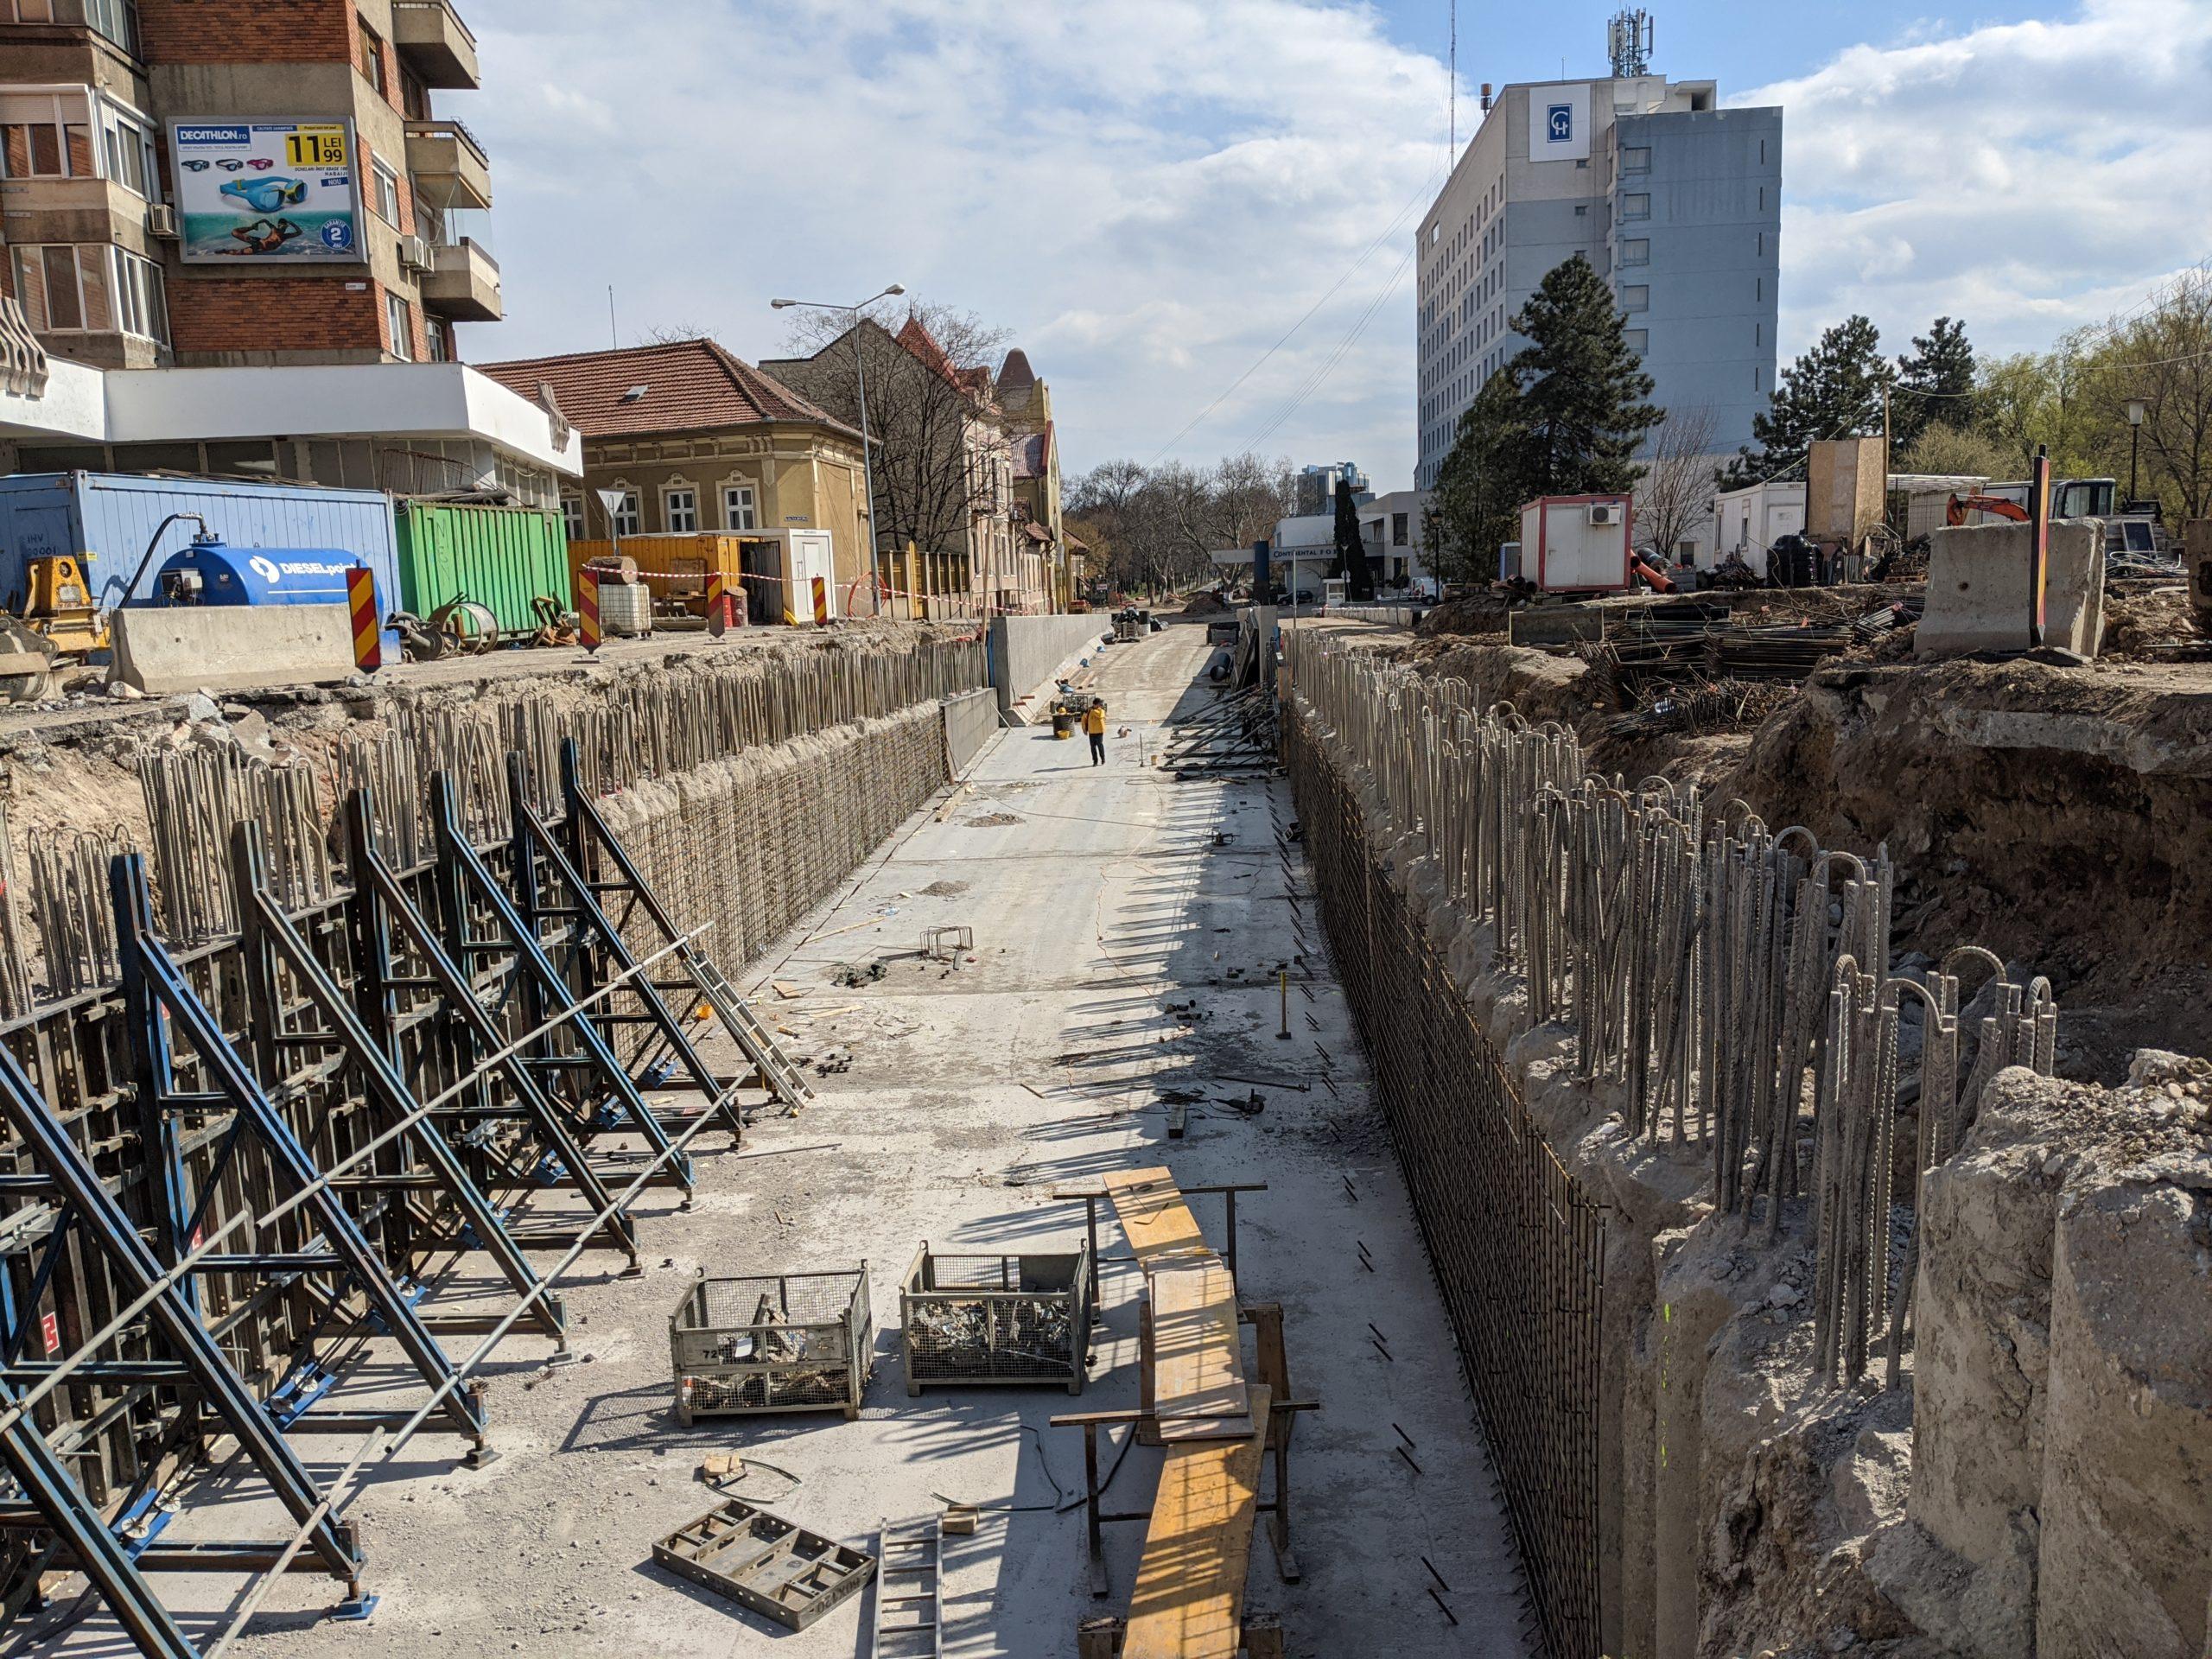 FOTO: Pasaj Magheru Oradea 25.03.2020